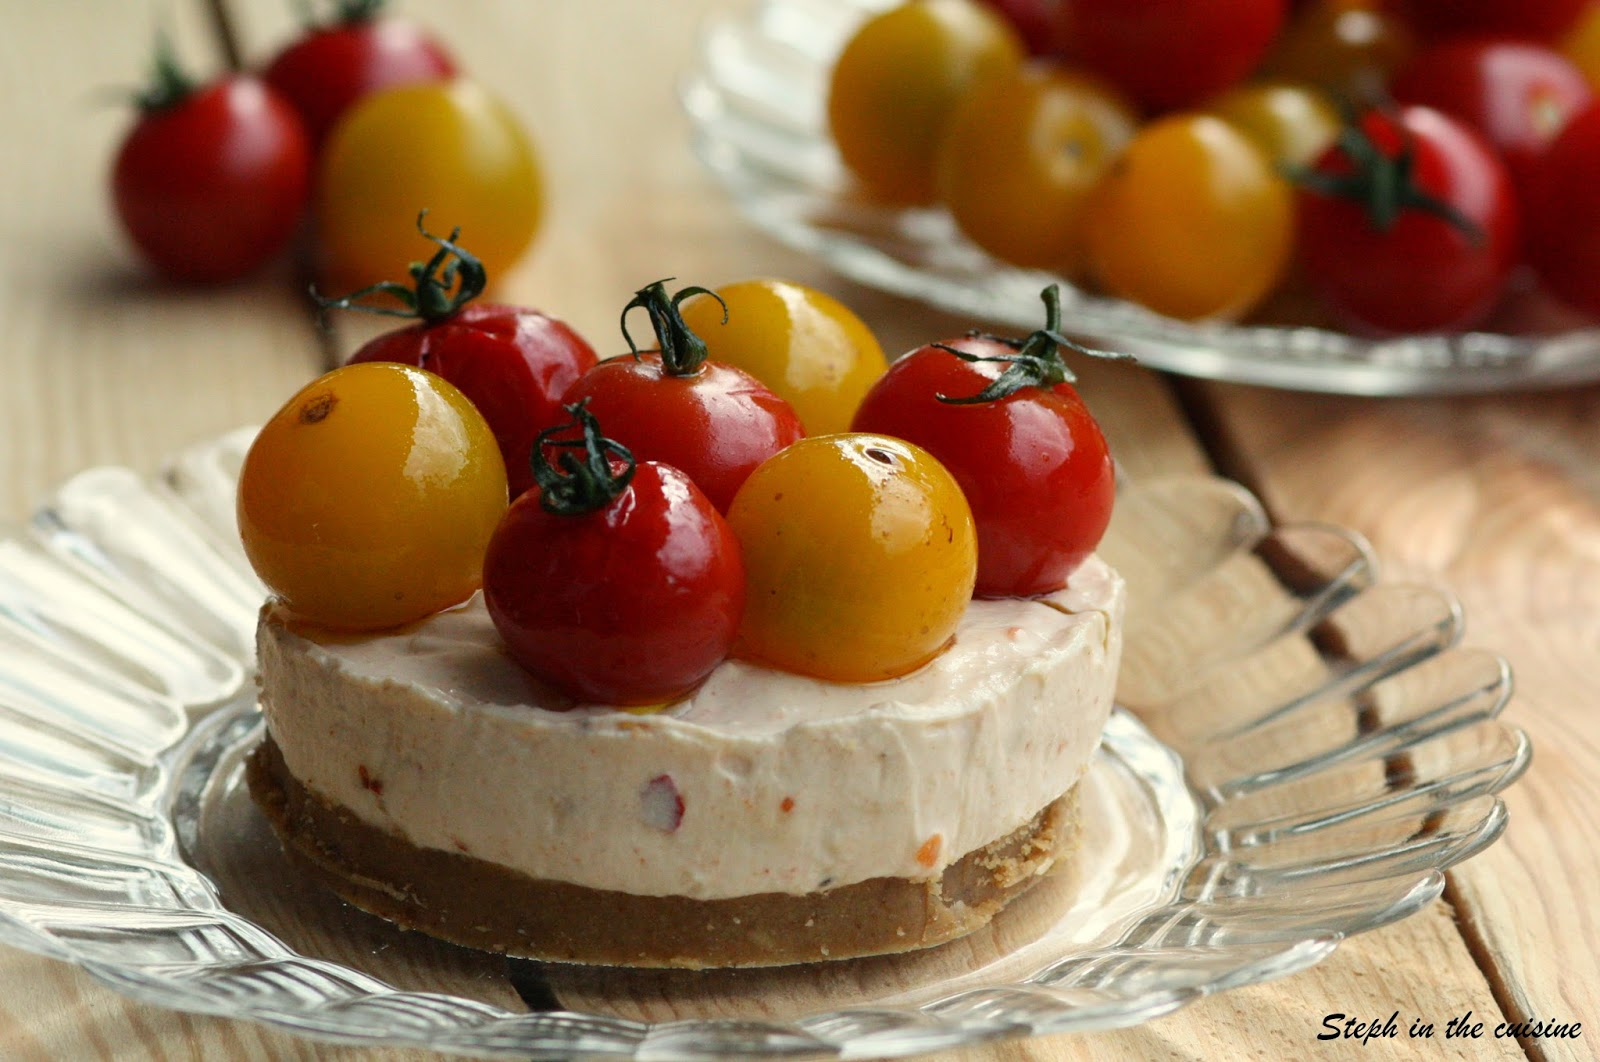 Exceptional Cheesecake Sale Sans Cuisson #6: Cheesecakes Salés Sans Cuisson U0026 Tomates Marinées